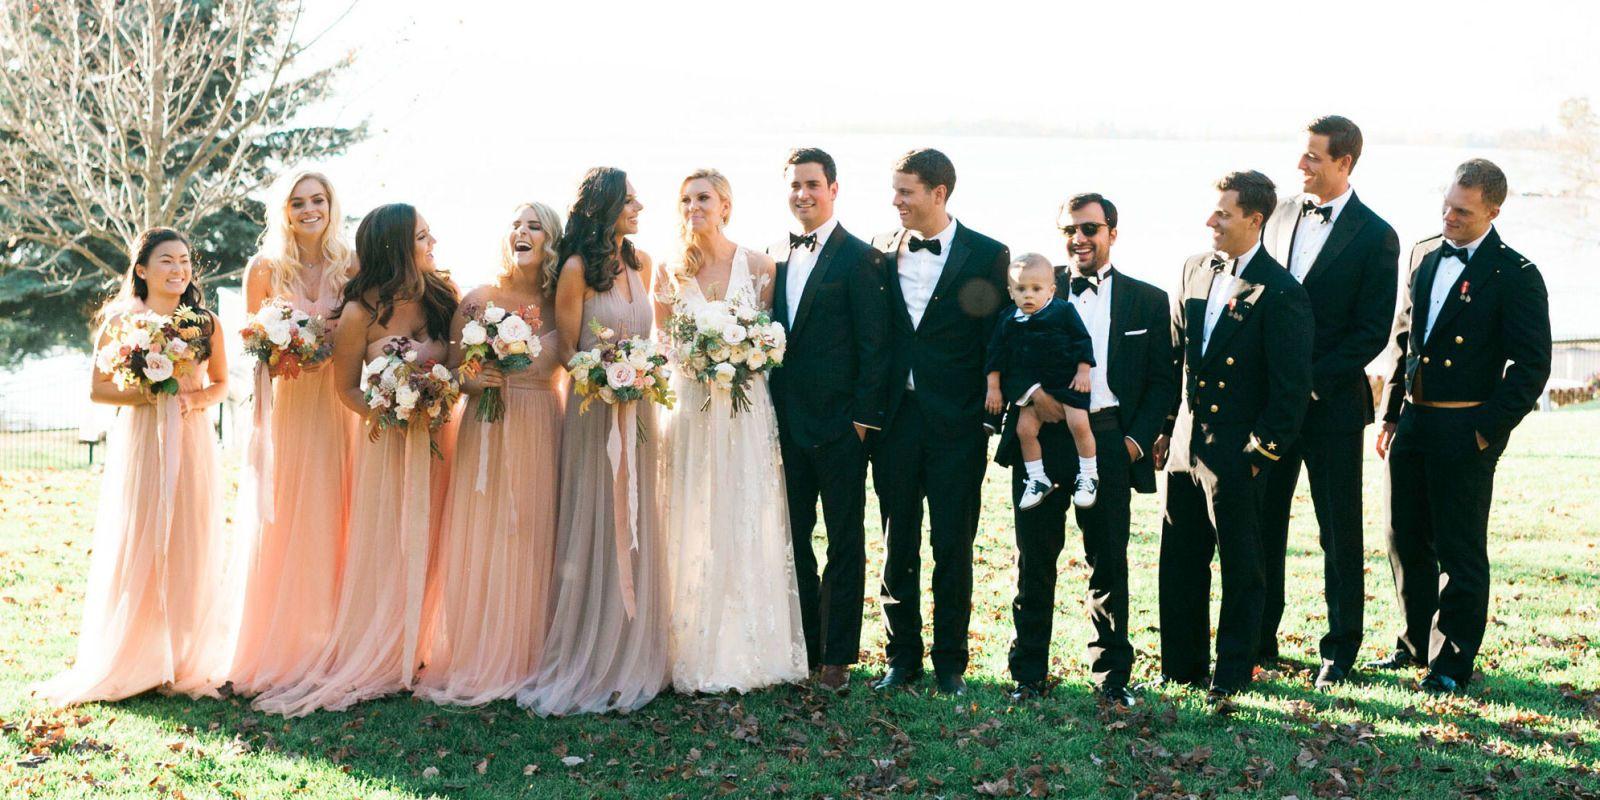 Mary Anne Huntsman And Evan Morgans Wedding In Montana